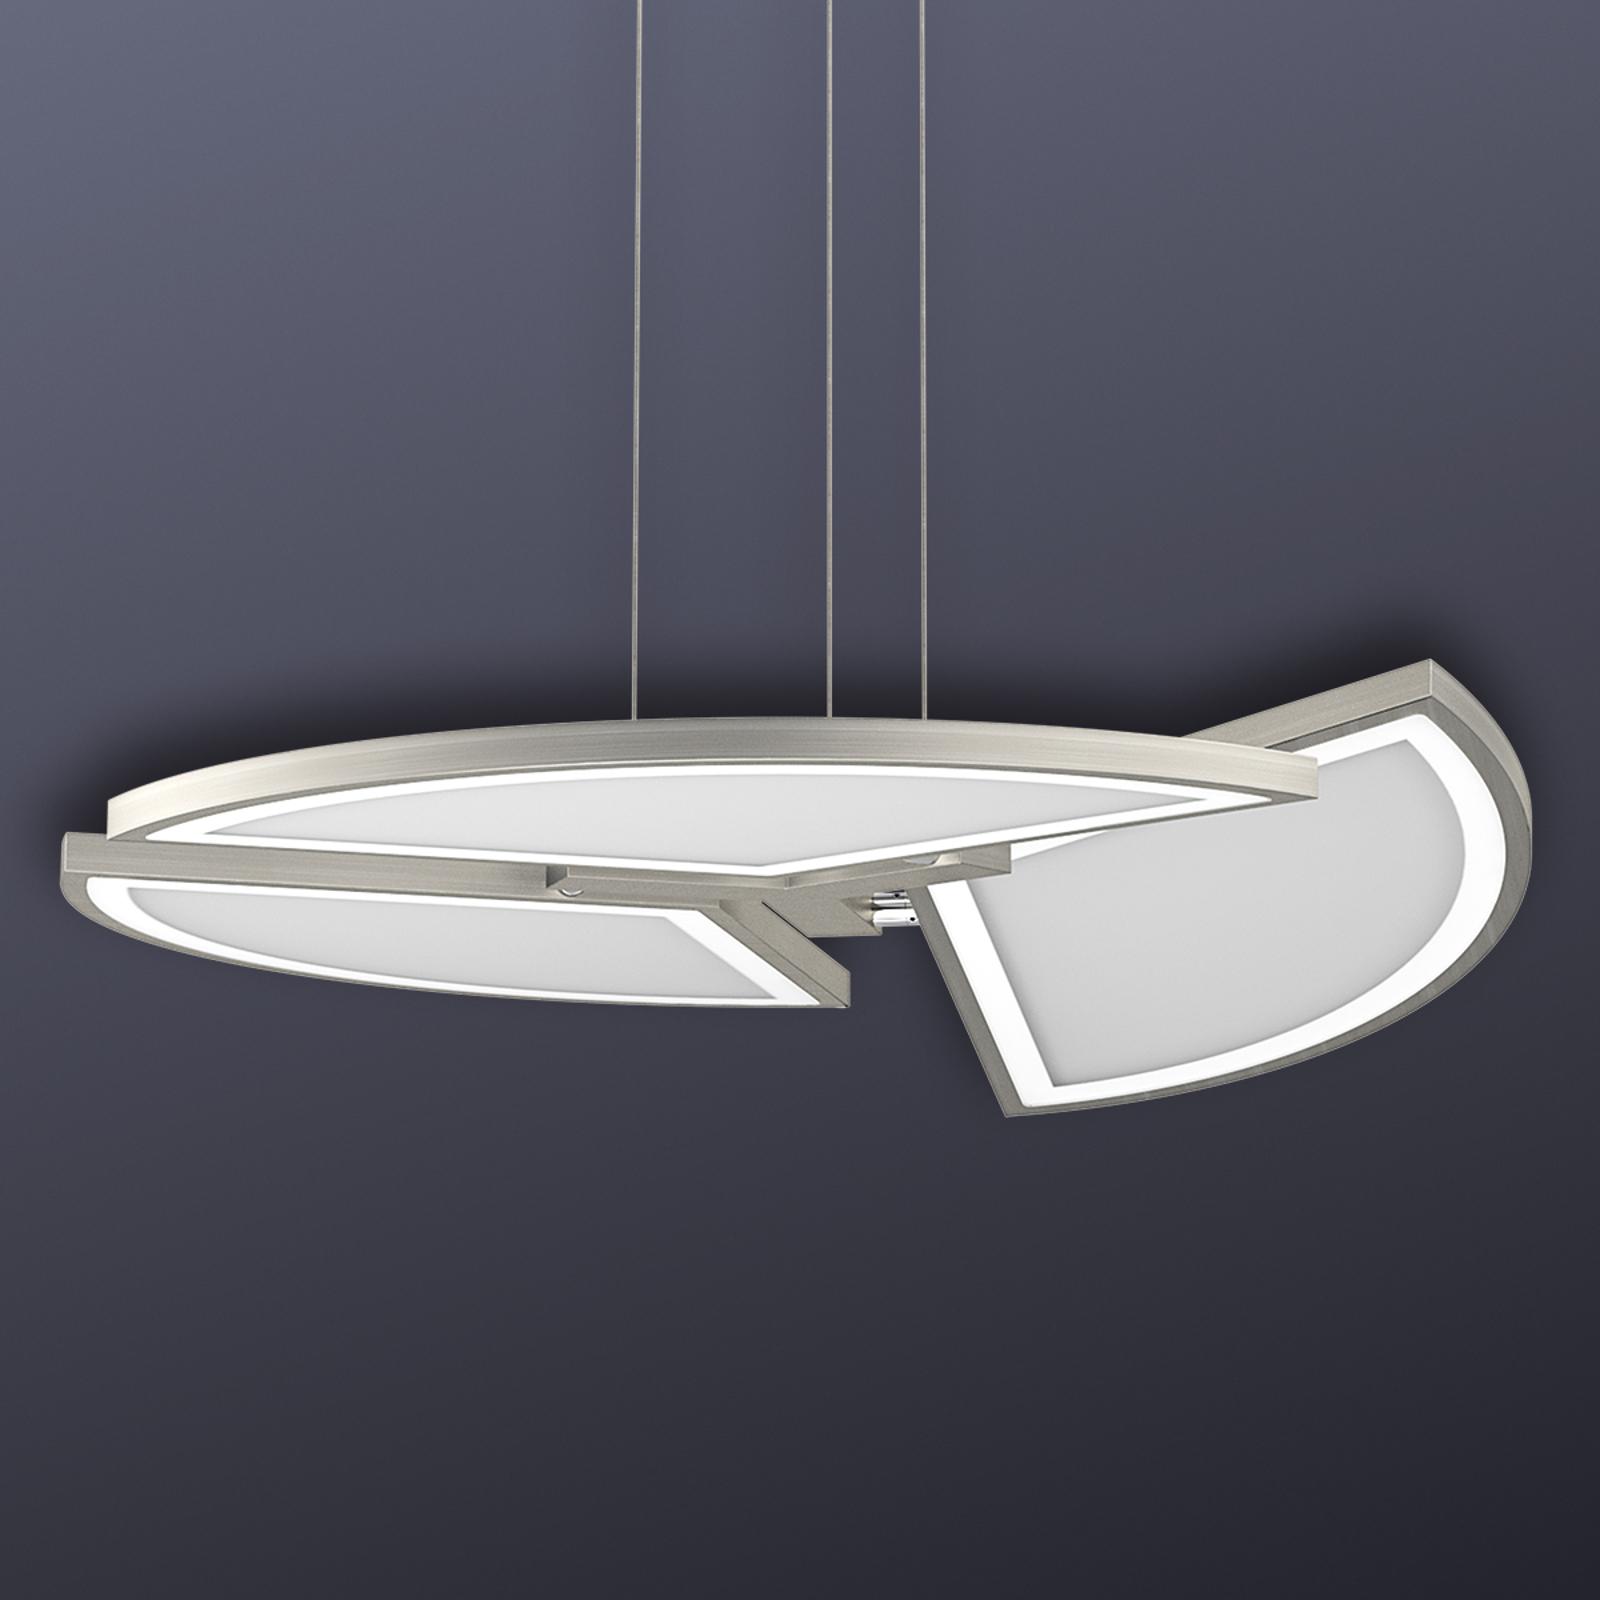 LED-pendellampe Movil med fleksibel innstilling